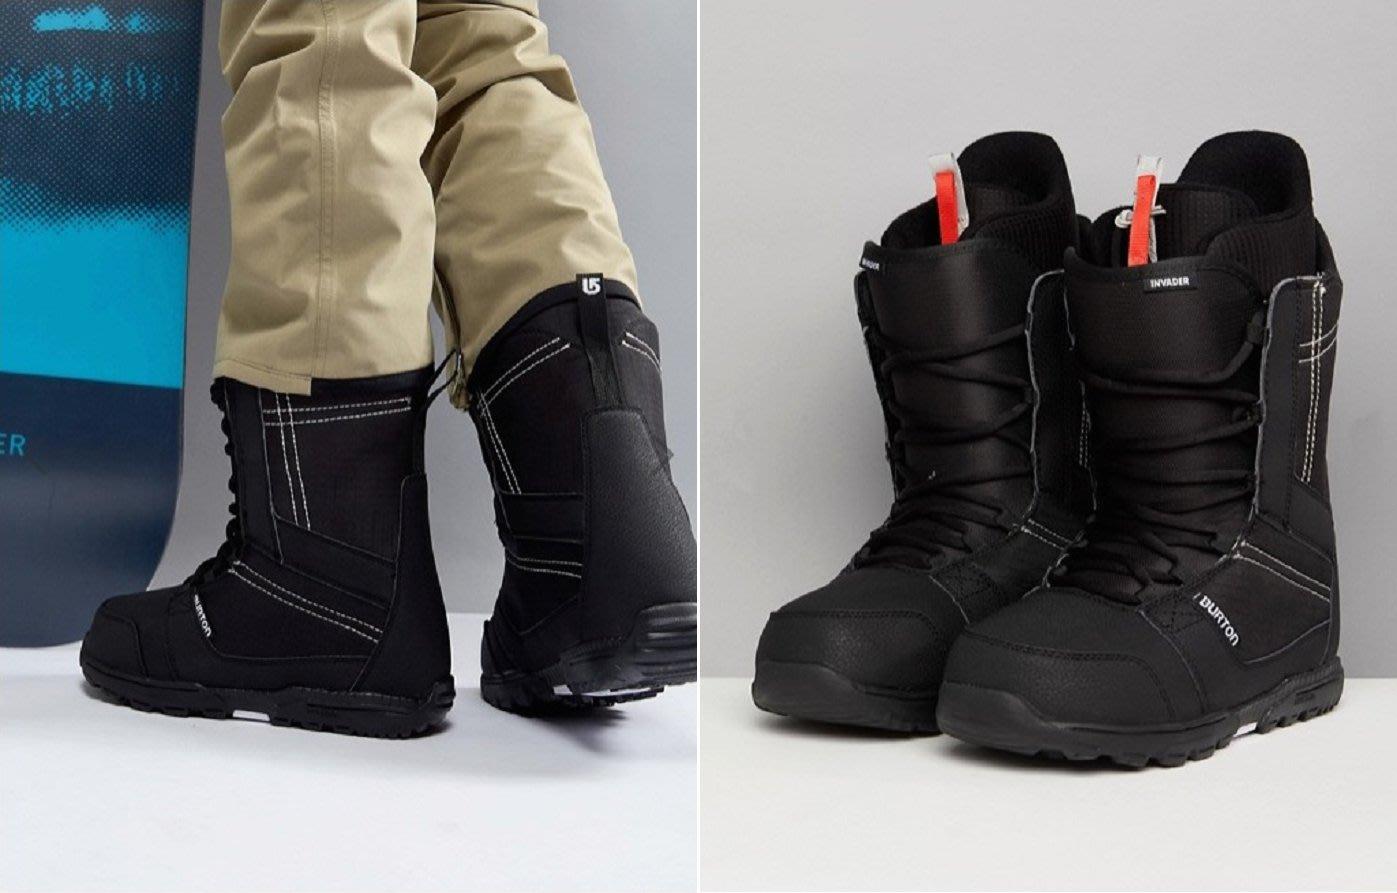 Burton Invader Snowboard Boot - Men's - US9 雪板鞋 雪靴